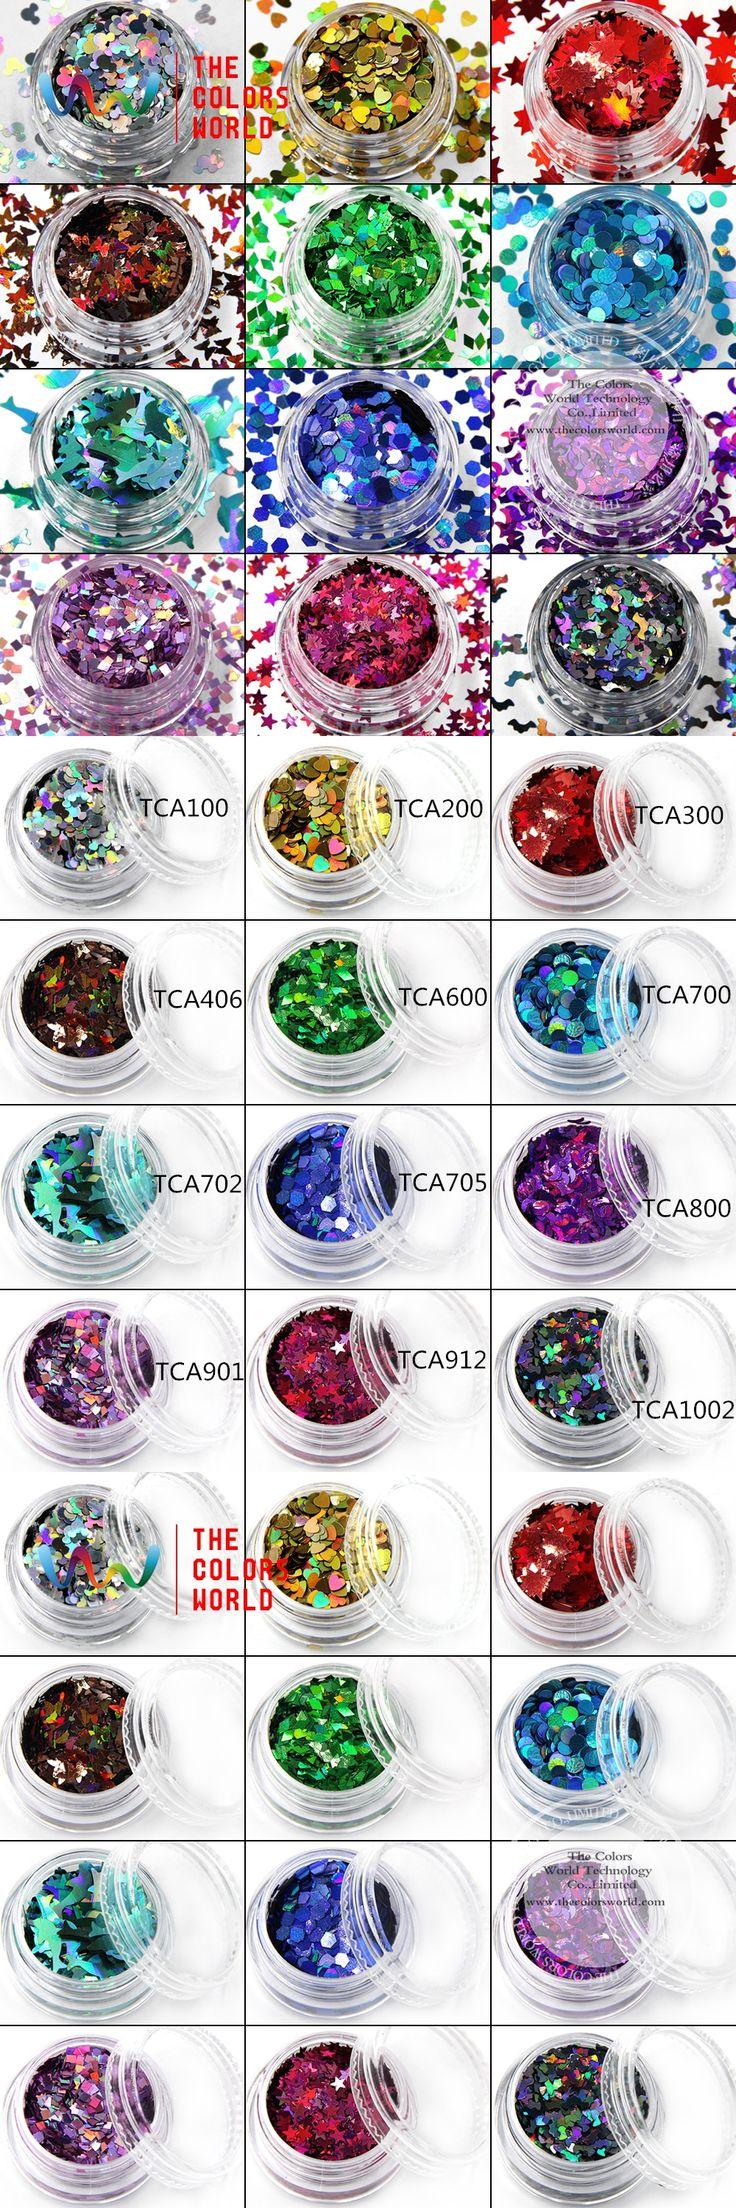 TCAST-001 Laser Color (Holographic )  12 kinds color and 12 kinds shape Glitter for nail art  nail gel,makeup and DIY decoration